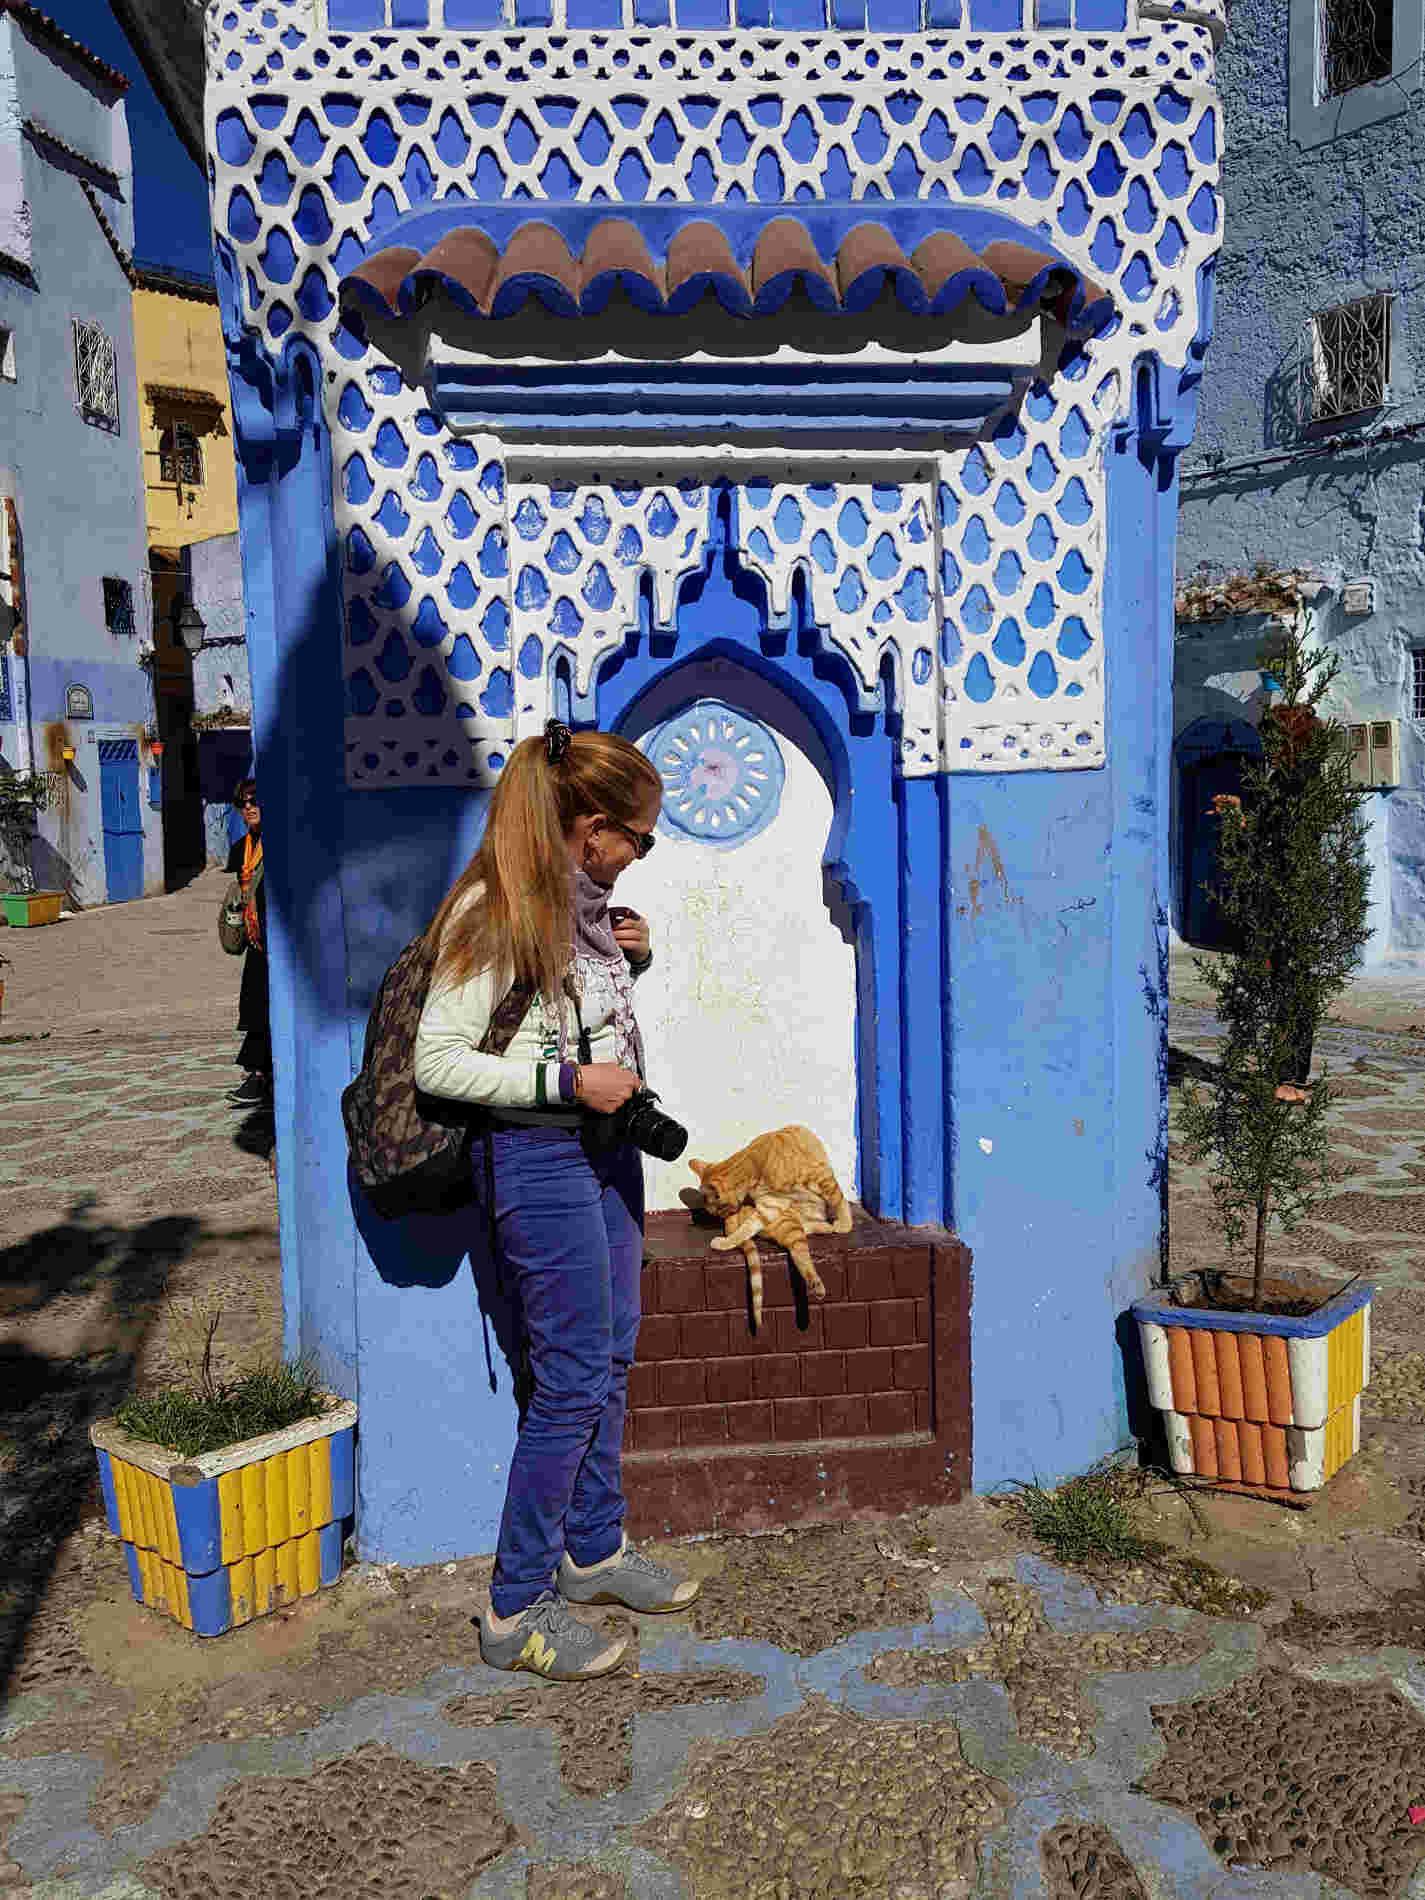 Chefchaouen cosa vedere - Piazza Haouta gatti